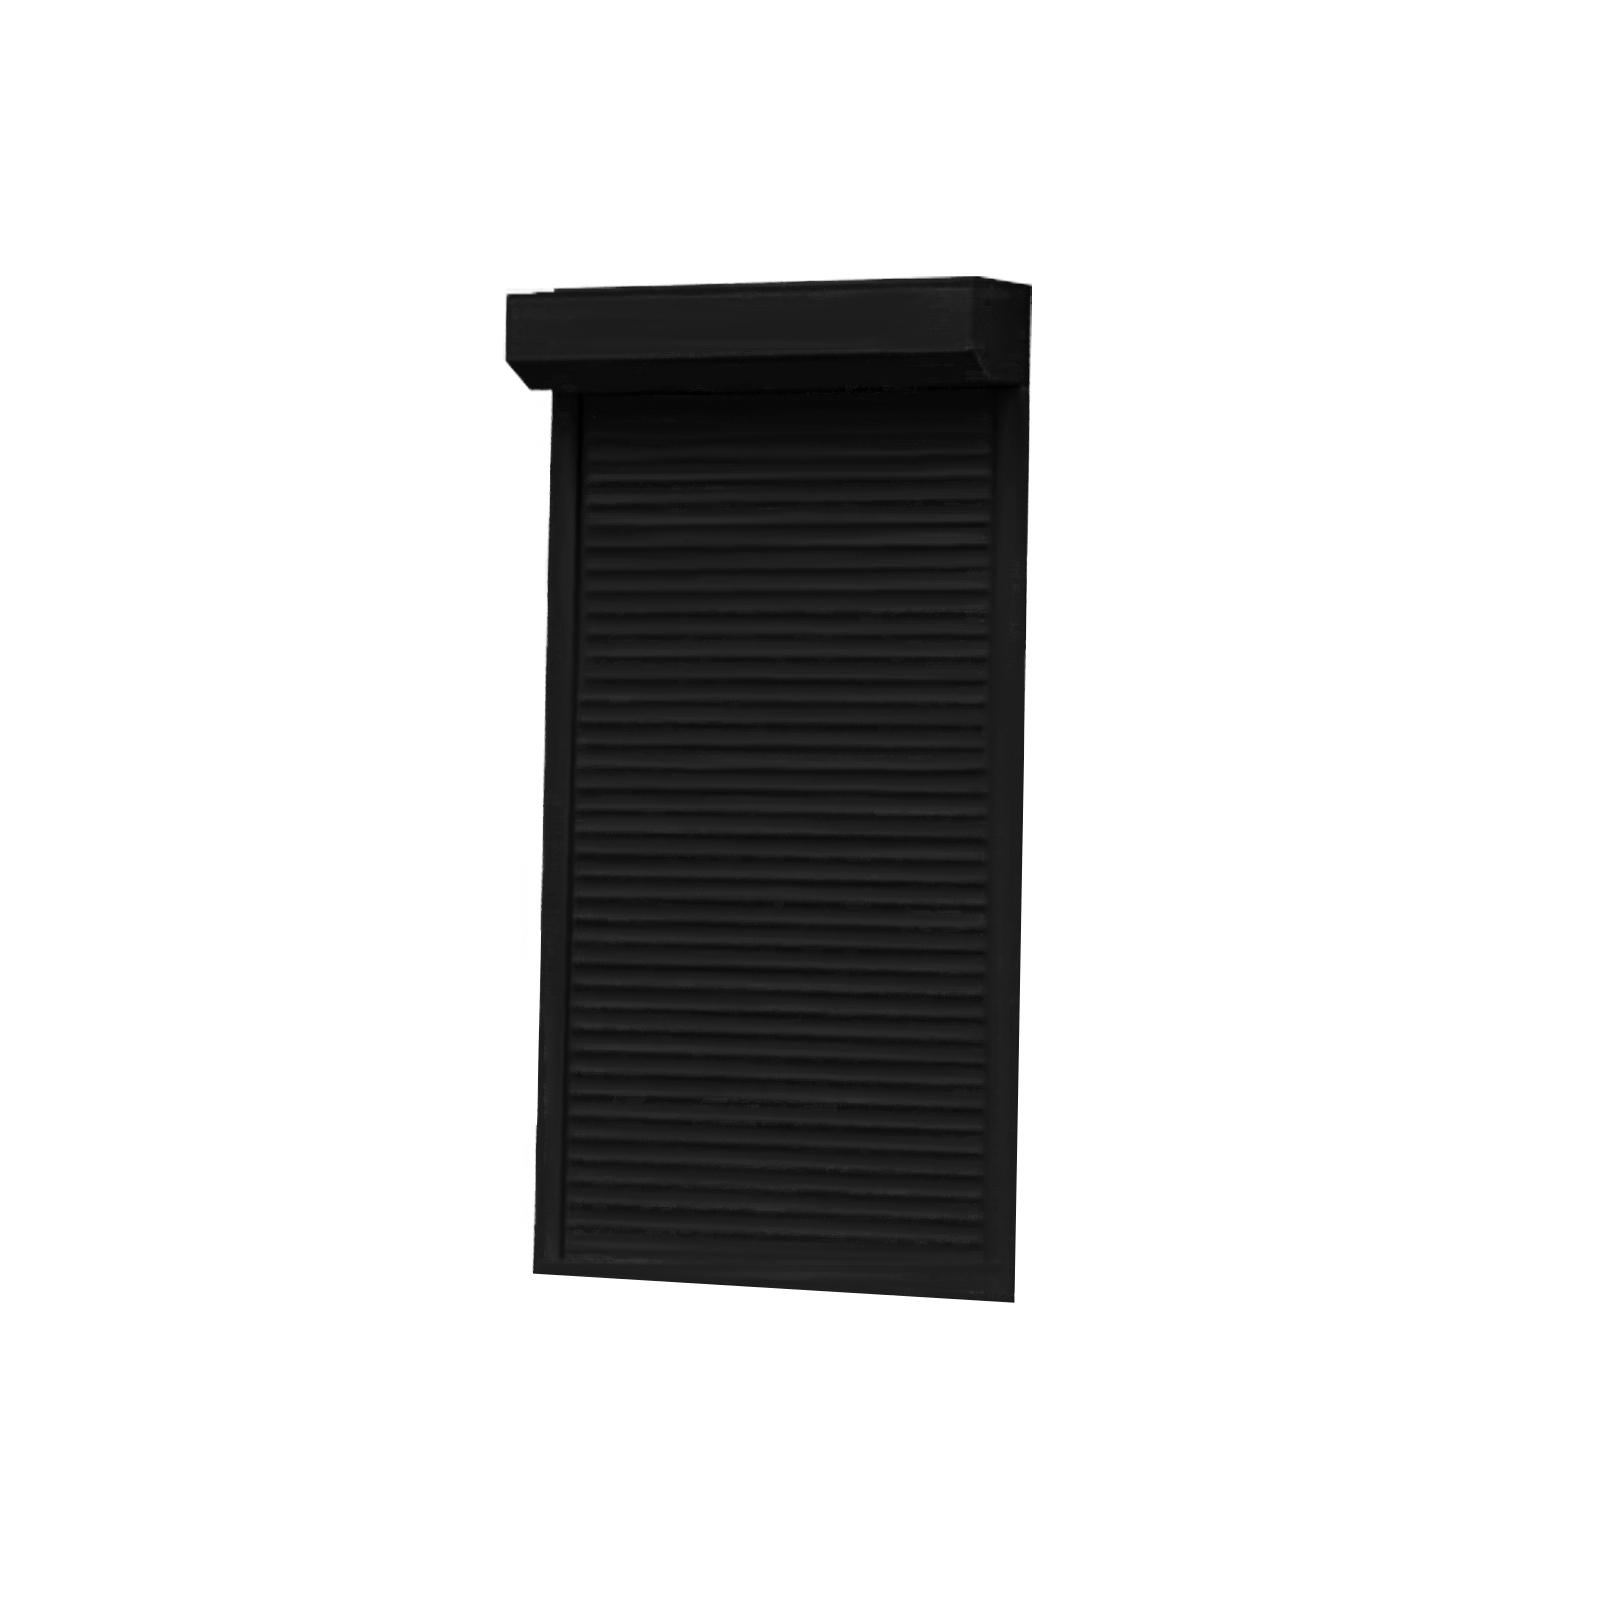 Everton 1801-2000mm H x 2001-2200mm W On-Wall Battery Roller Shutter